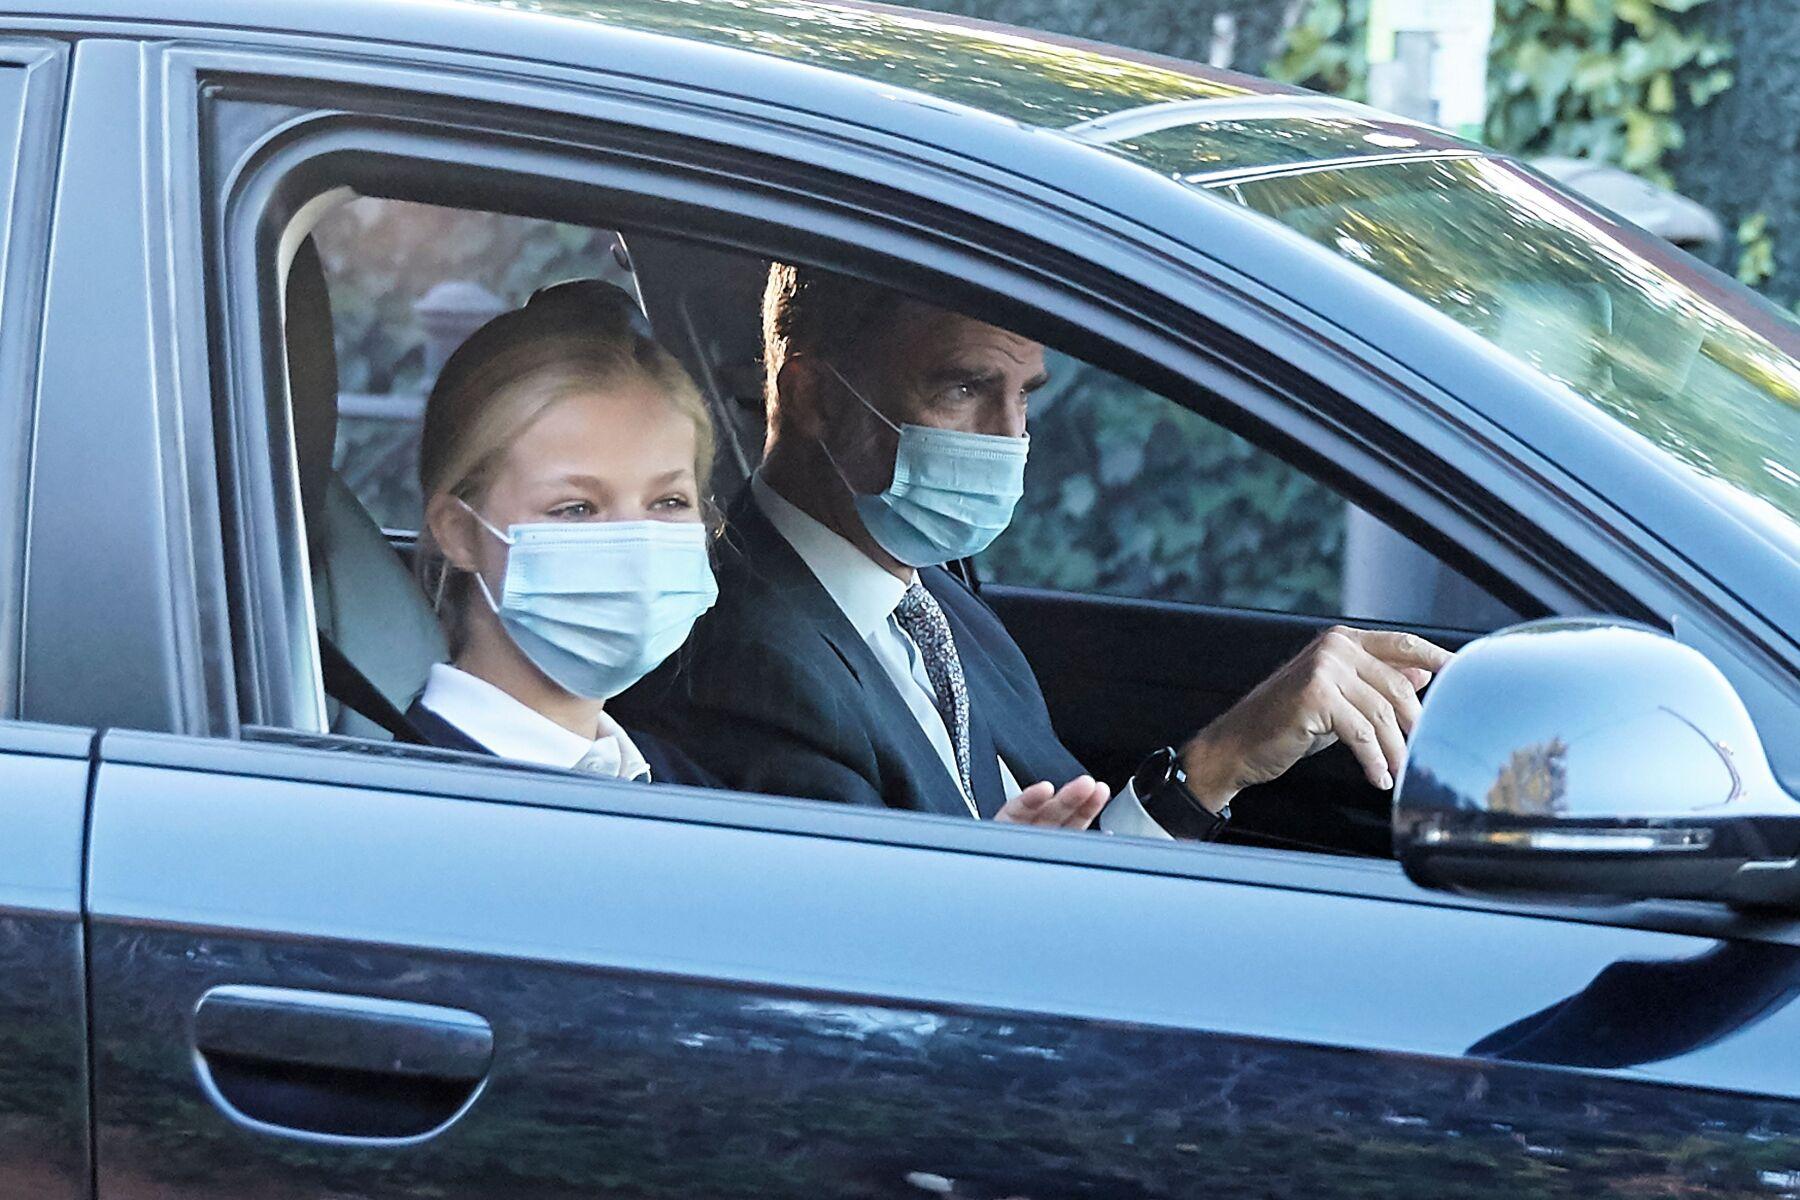 King Felipe VI and Princess Leonor arrive at 'Santa Maria de los Rosales' school, Madrid, Spain - 09 Sep 2020